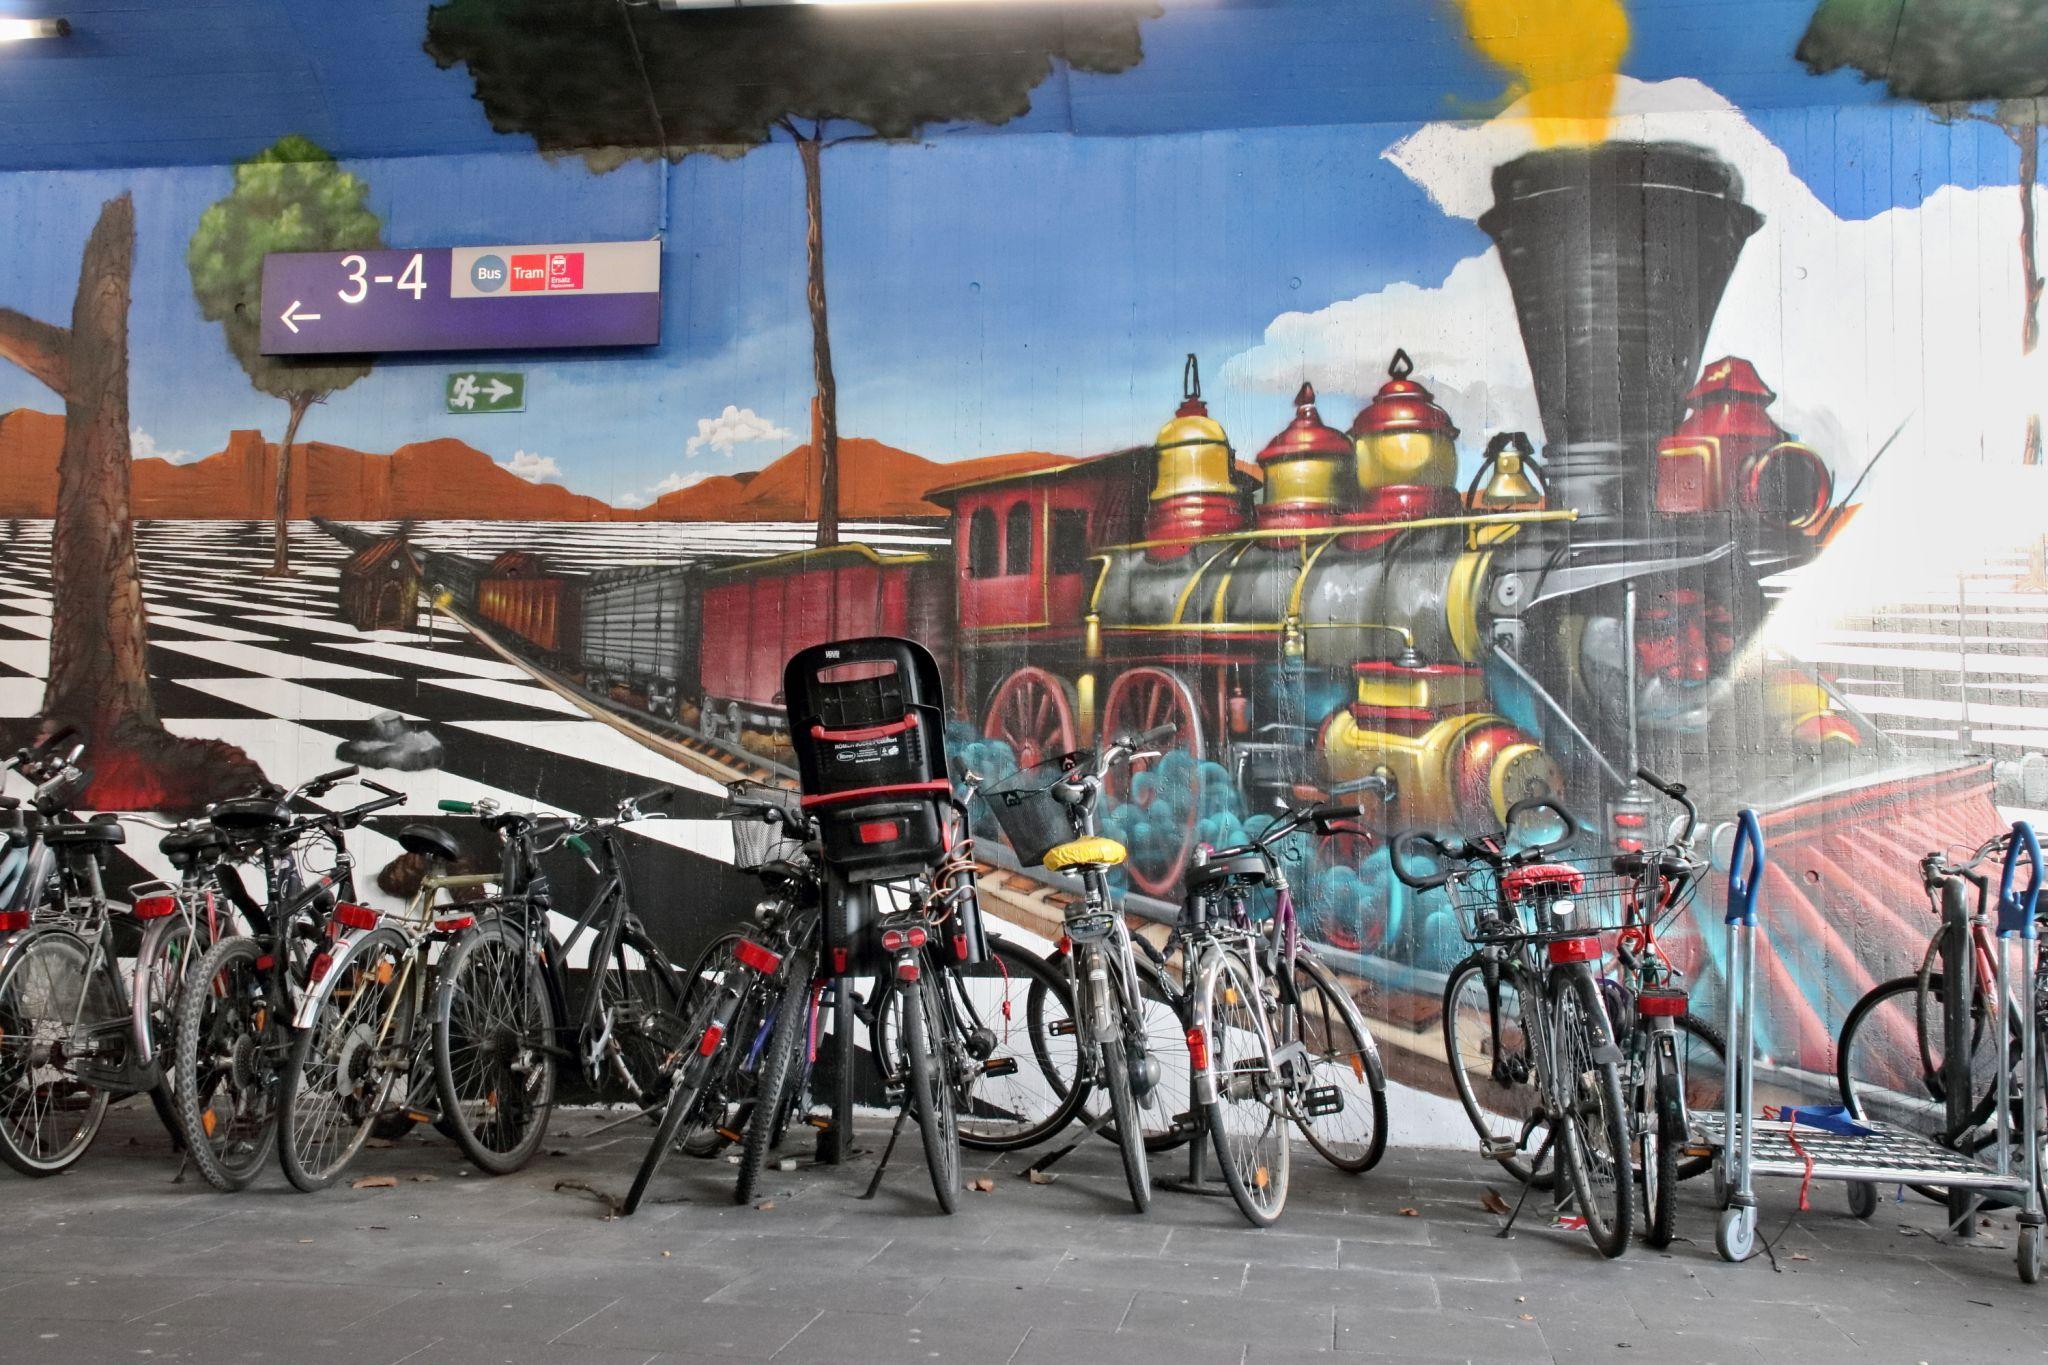 Grafitti am Bahnhof Ehrenfeld, Germany